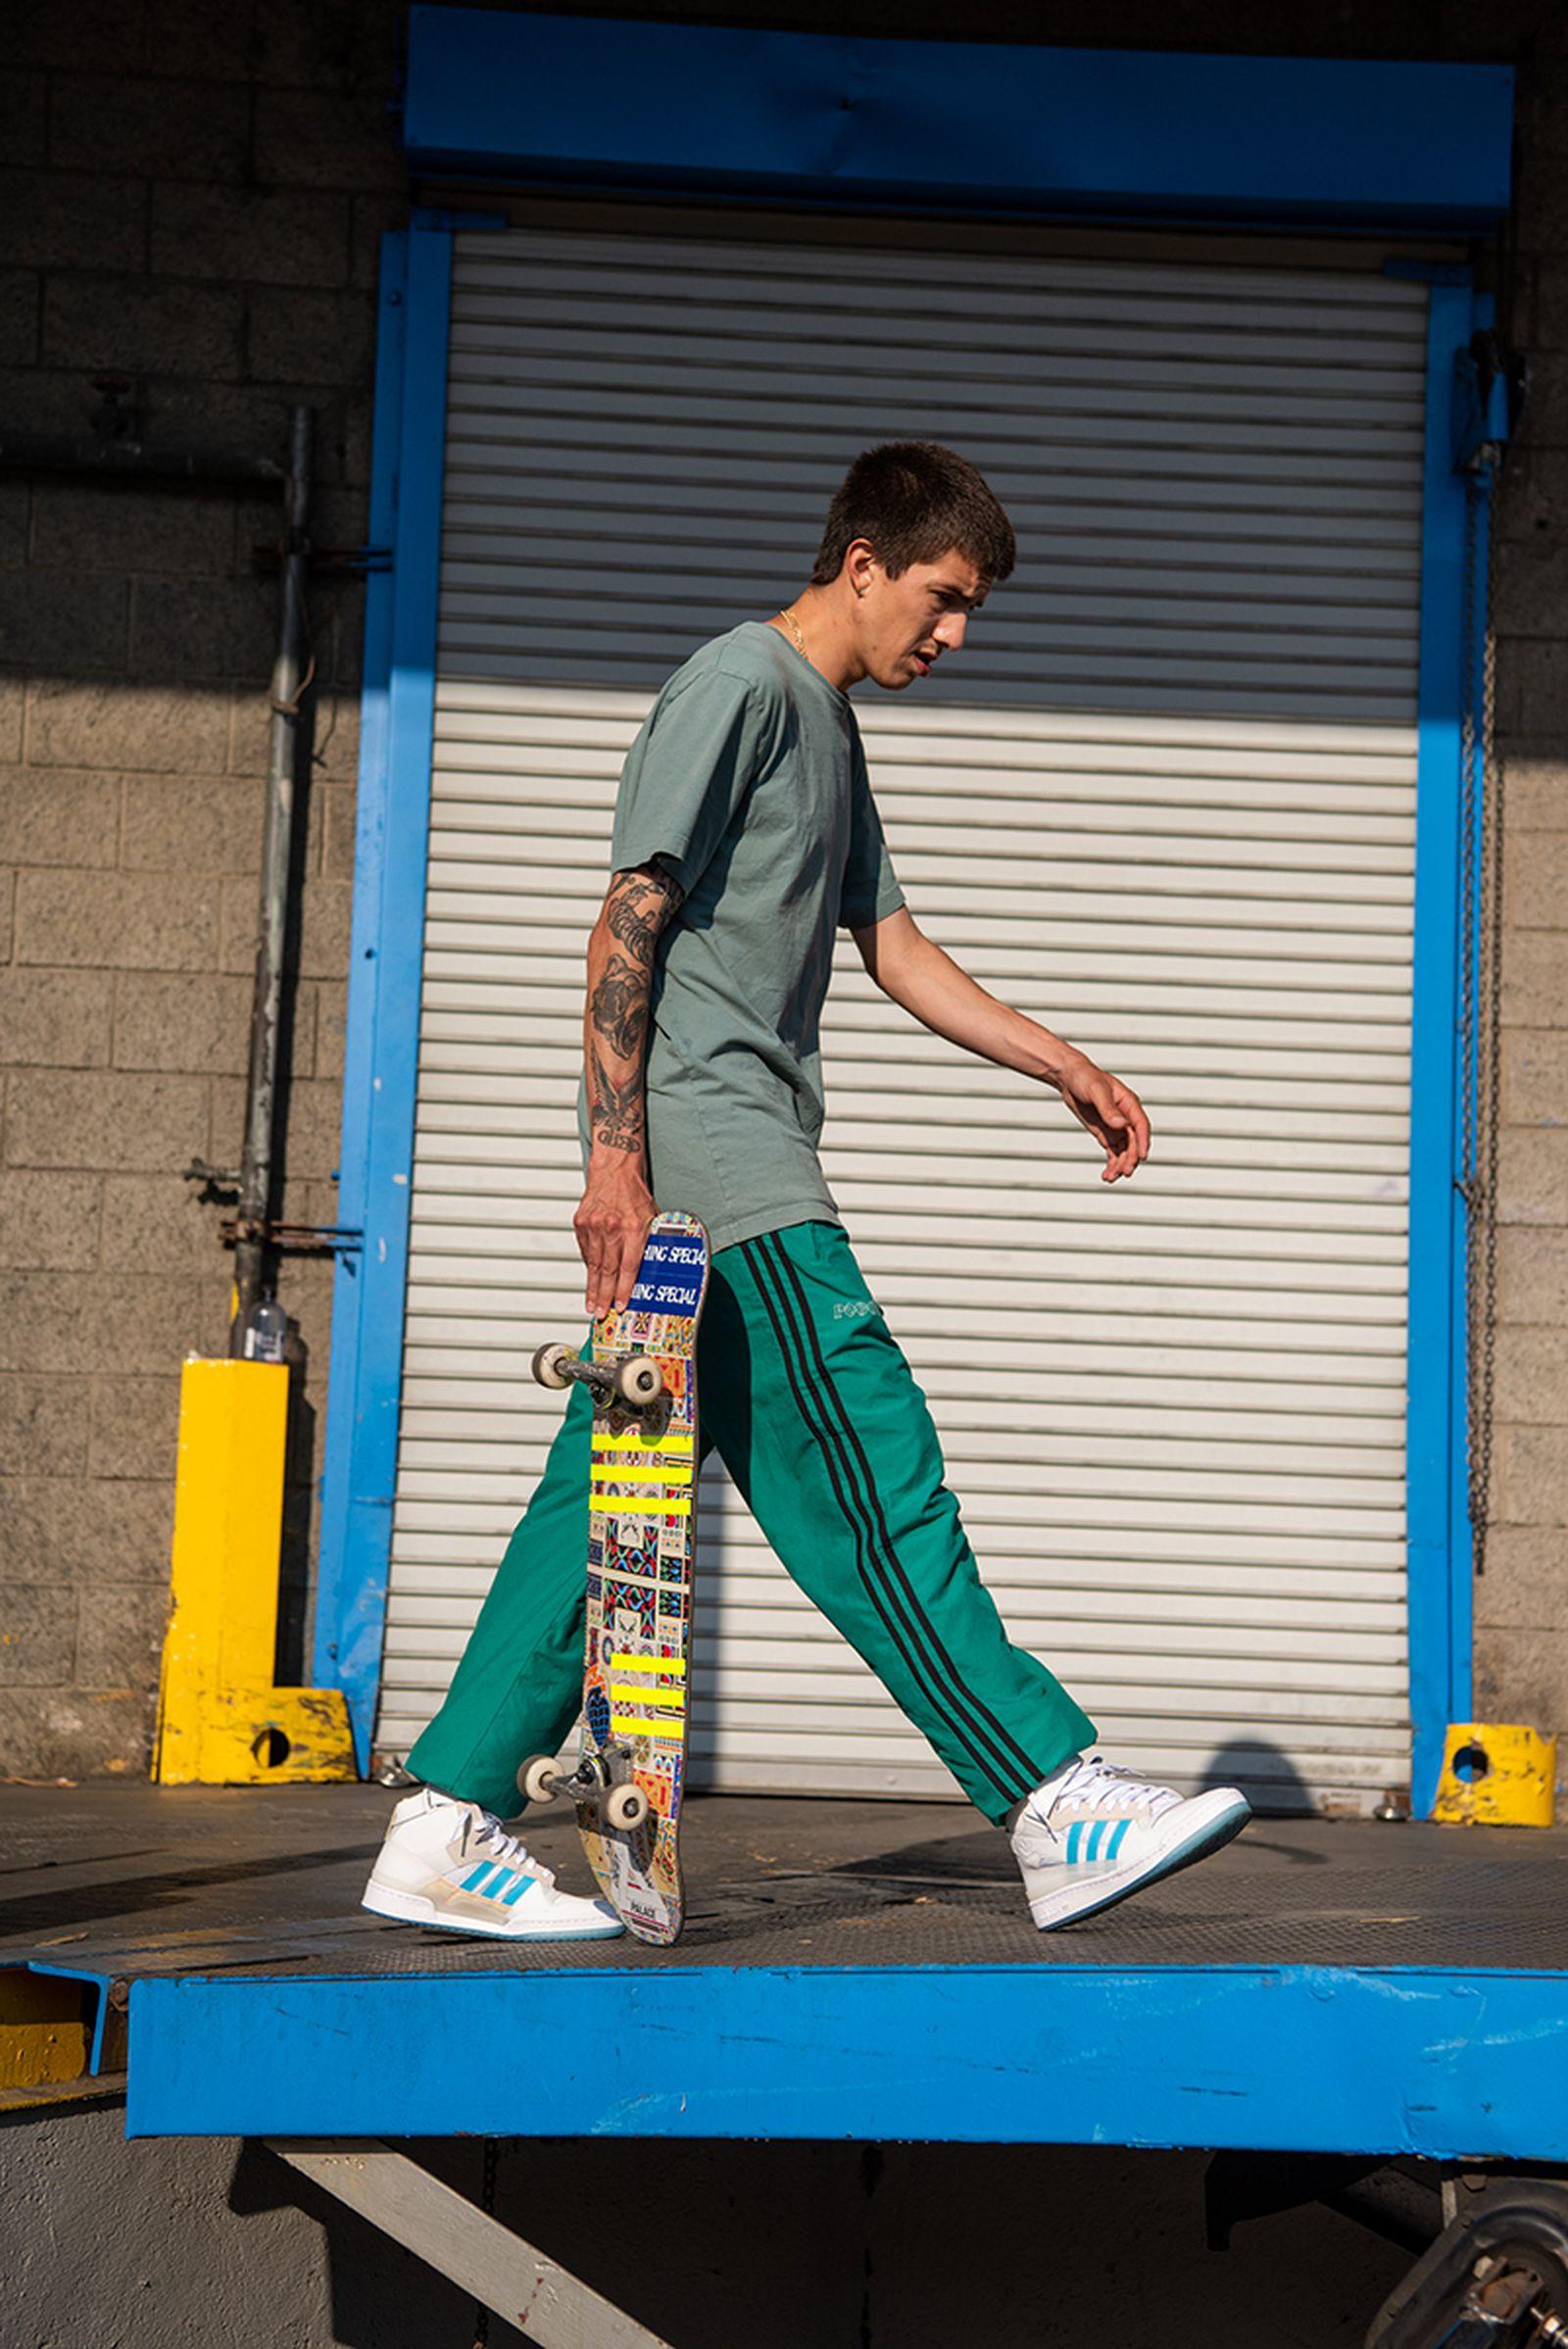 adidas-skateboarding-forum-84-adv-diego-najera-release-date-price-08